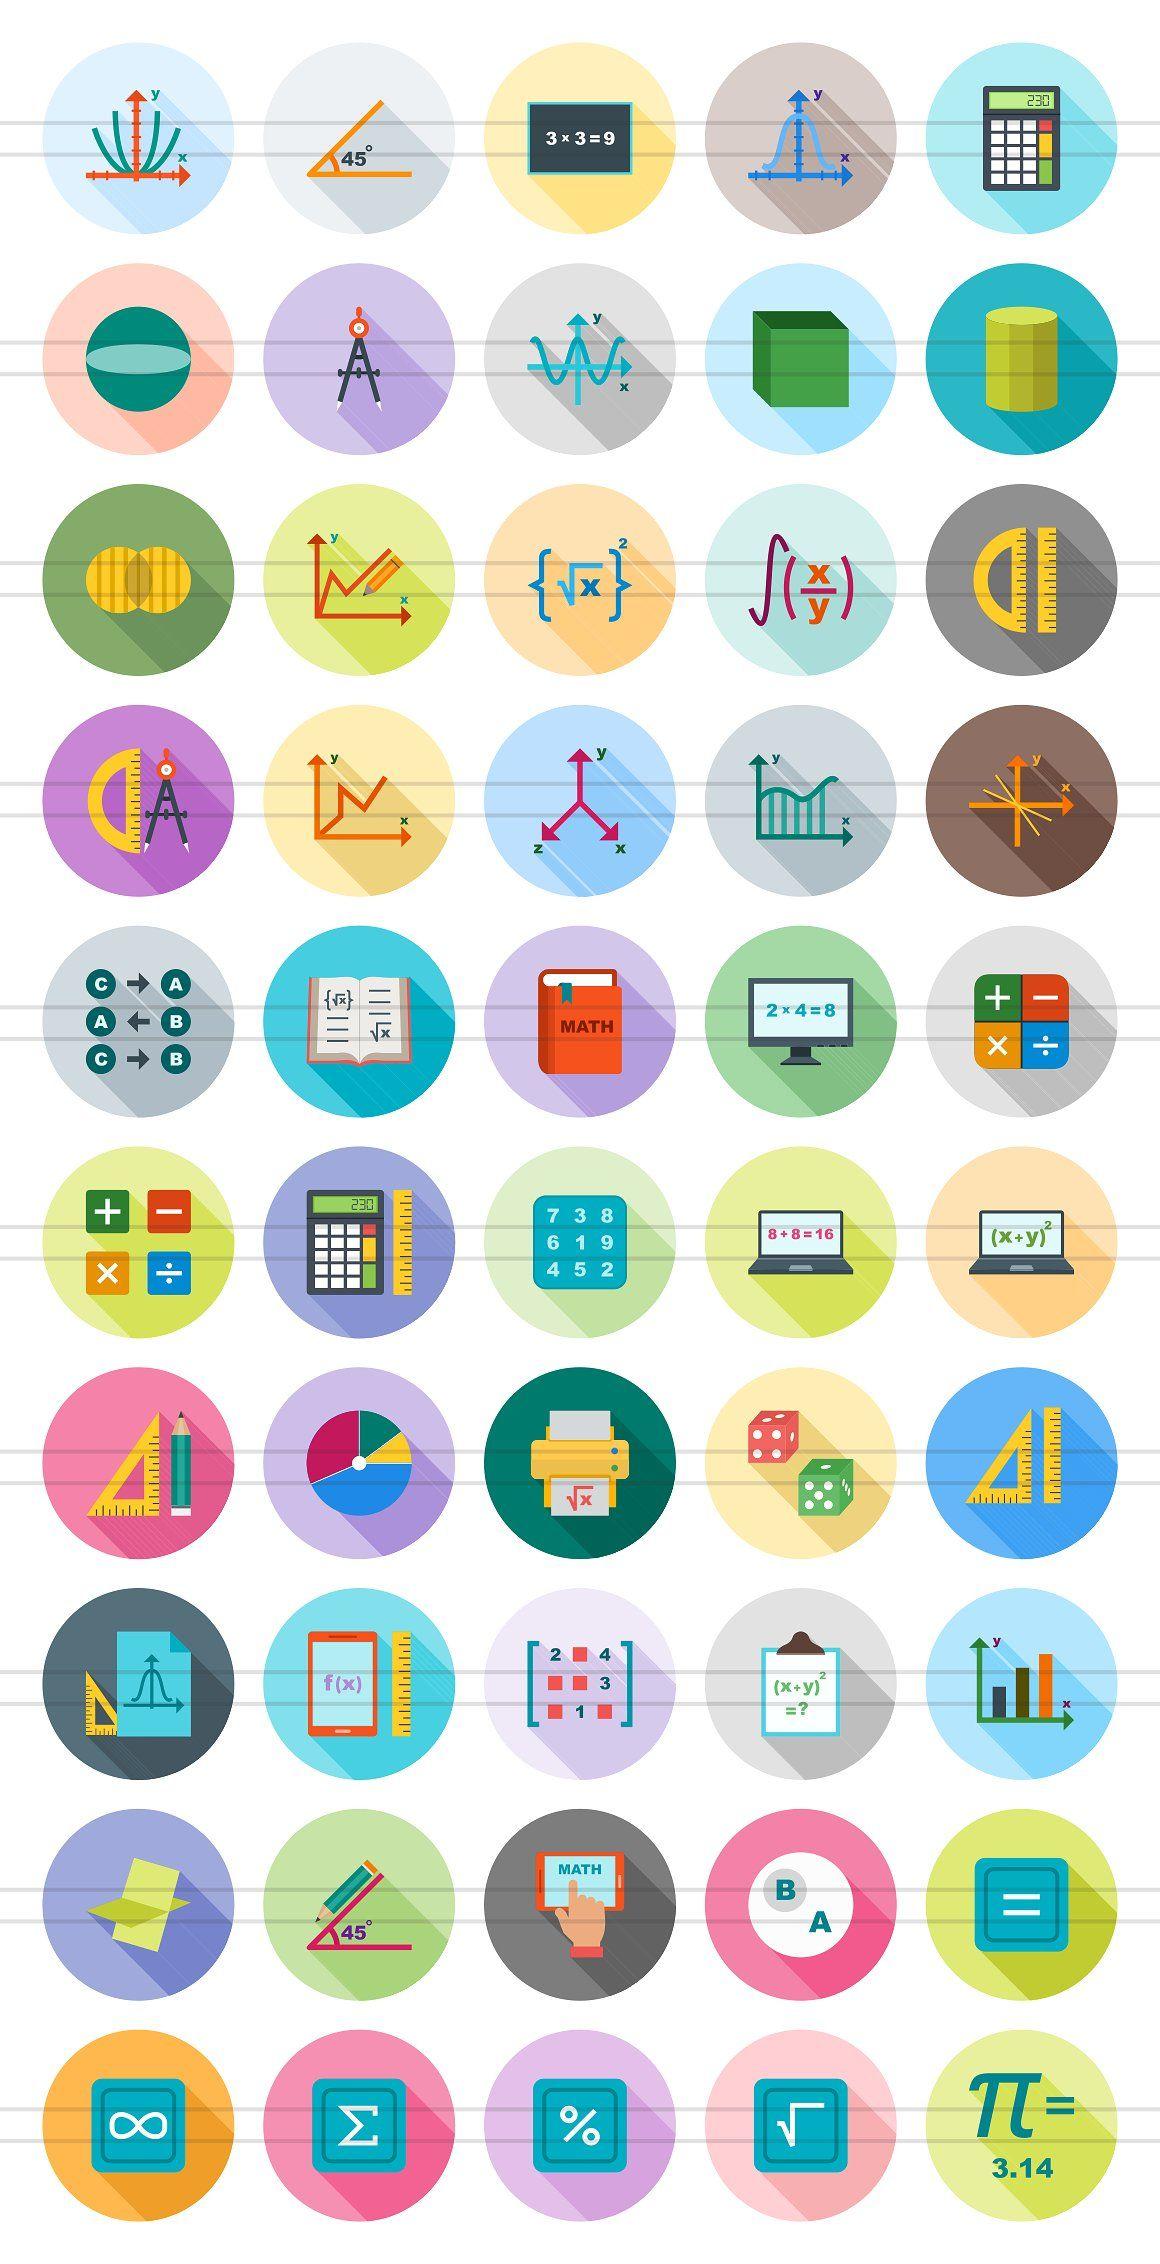 50 Math Symbols Flat Shadowed Icons (con imágenes